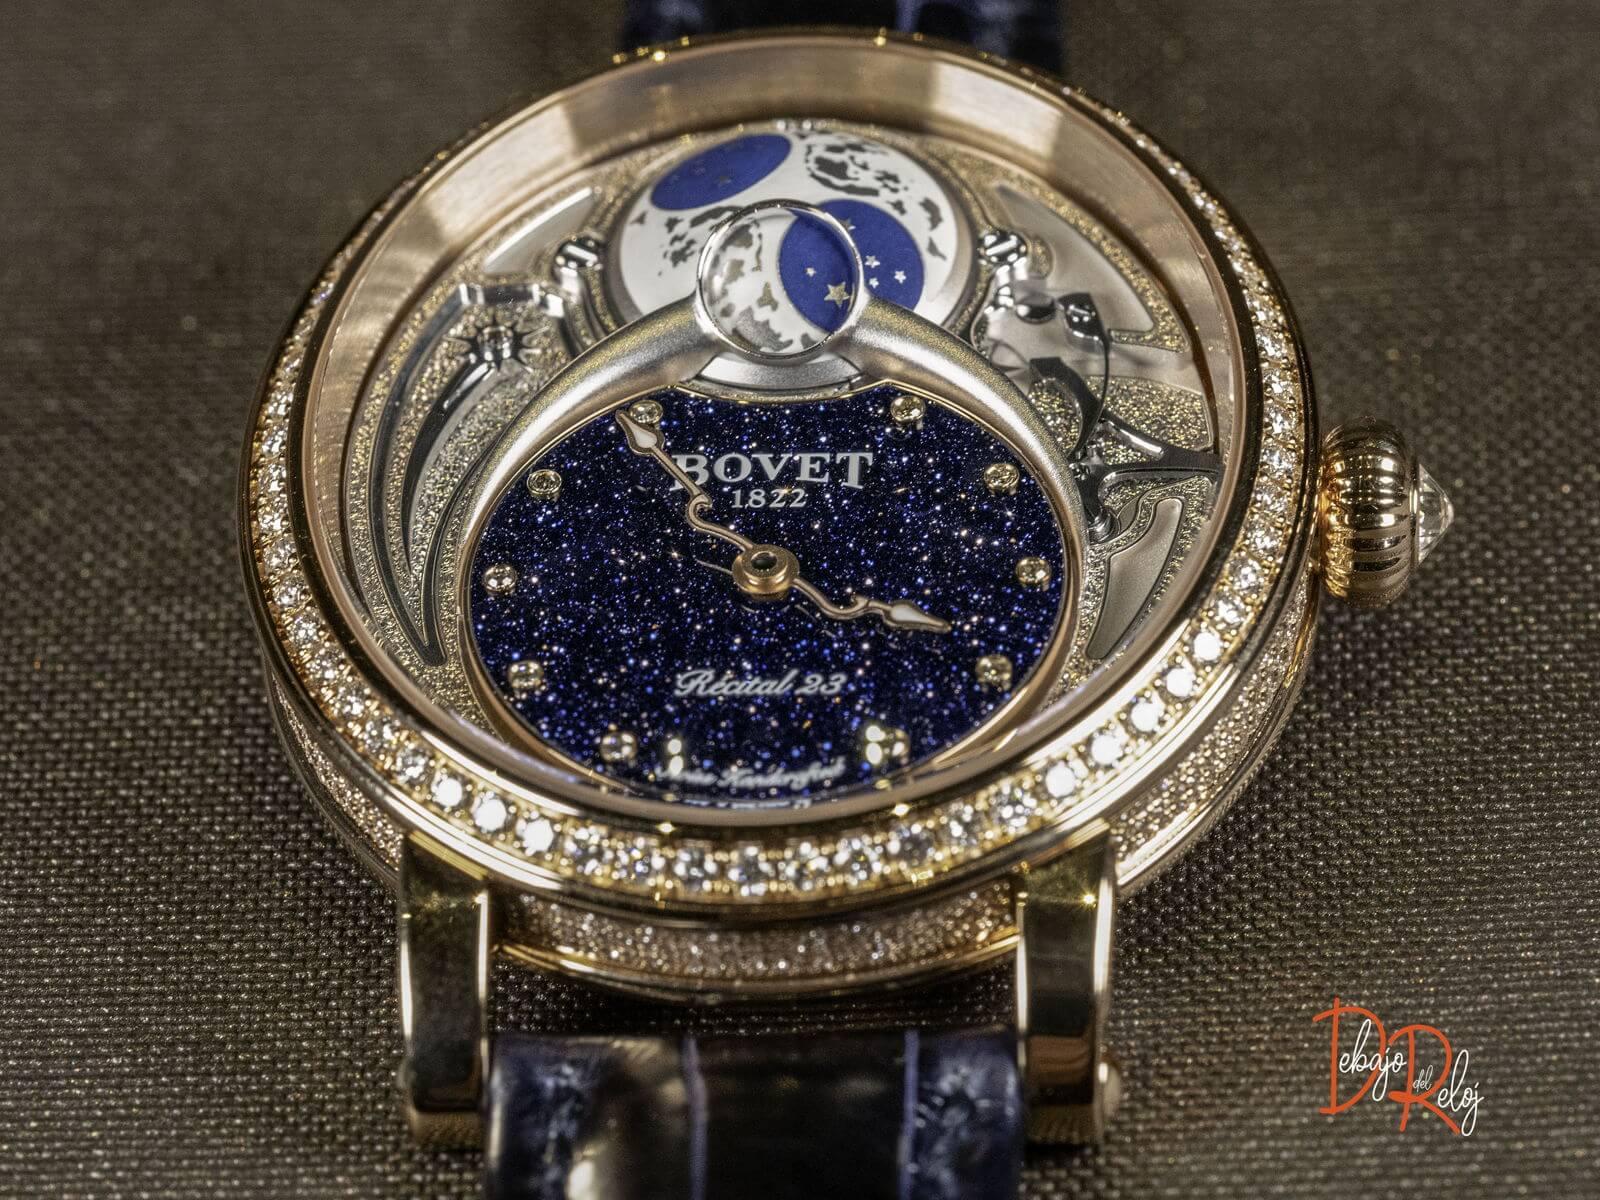 Bovet 1822 Recital 23 Fase Lunar cobra